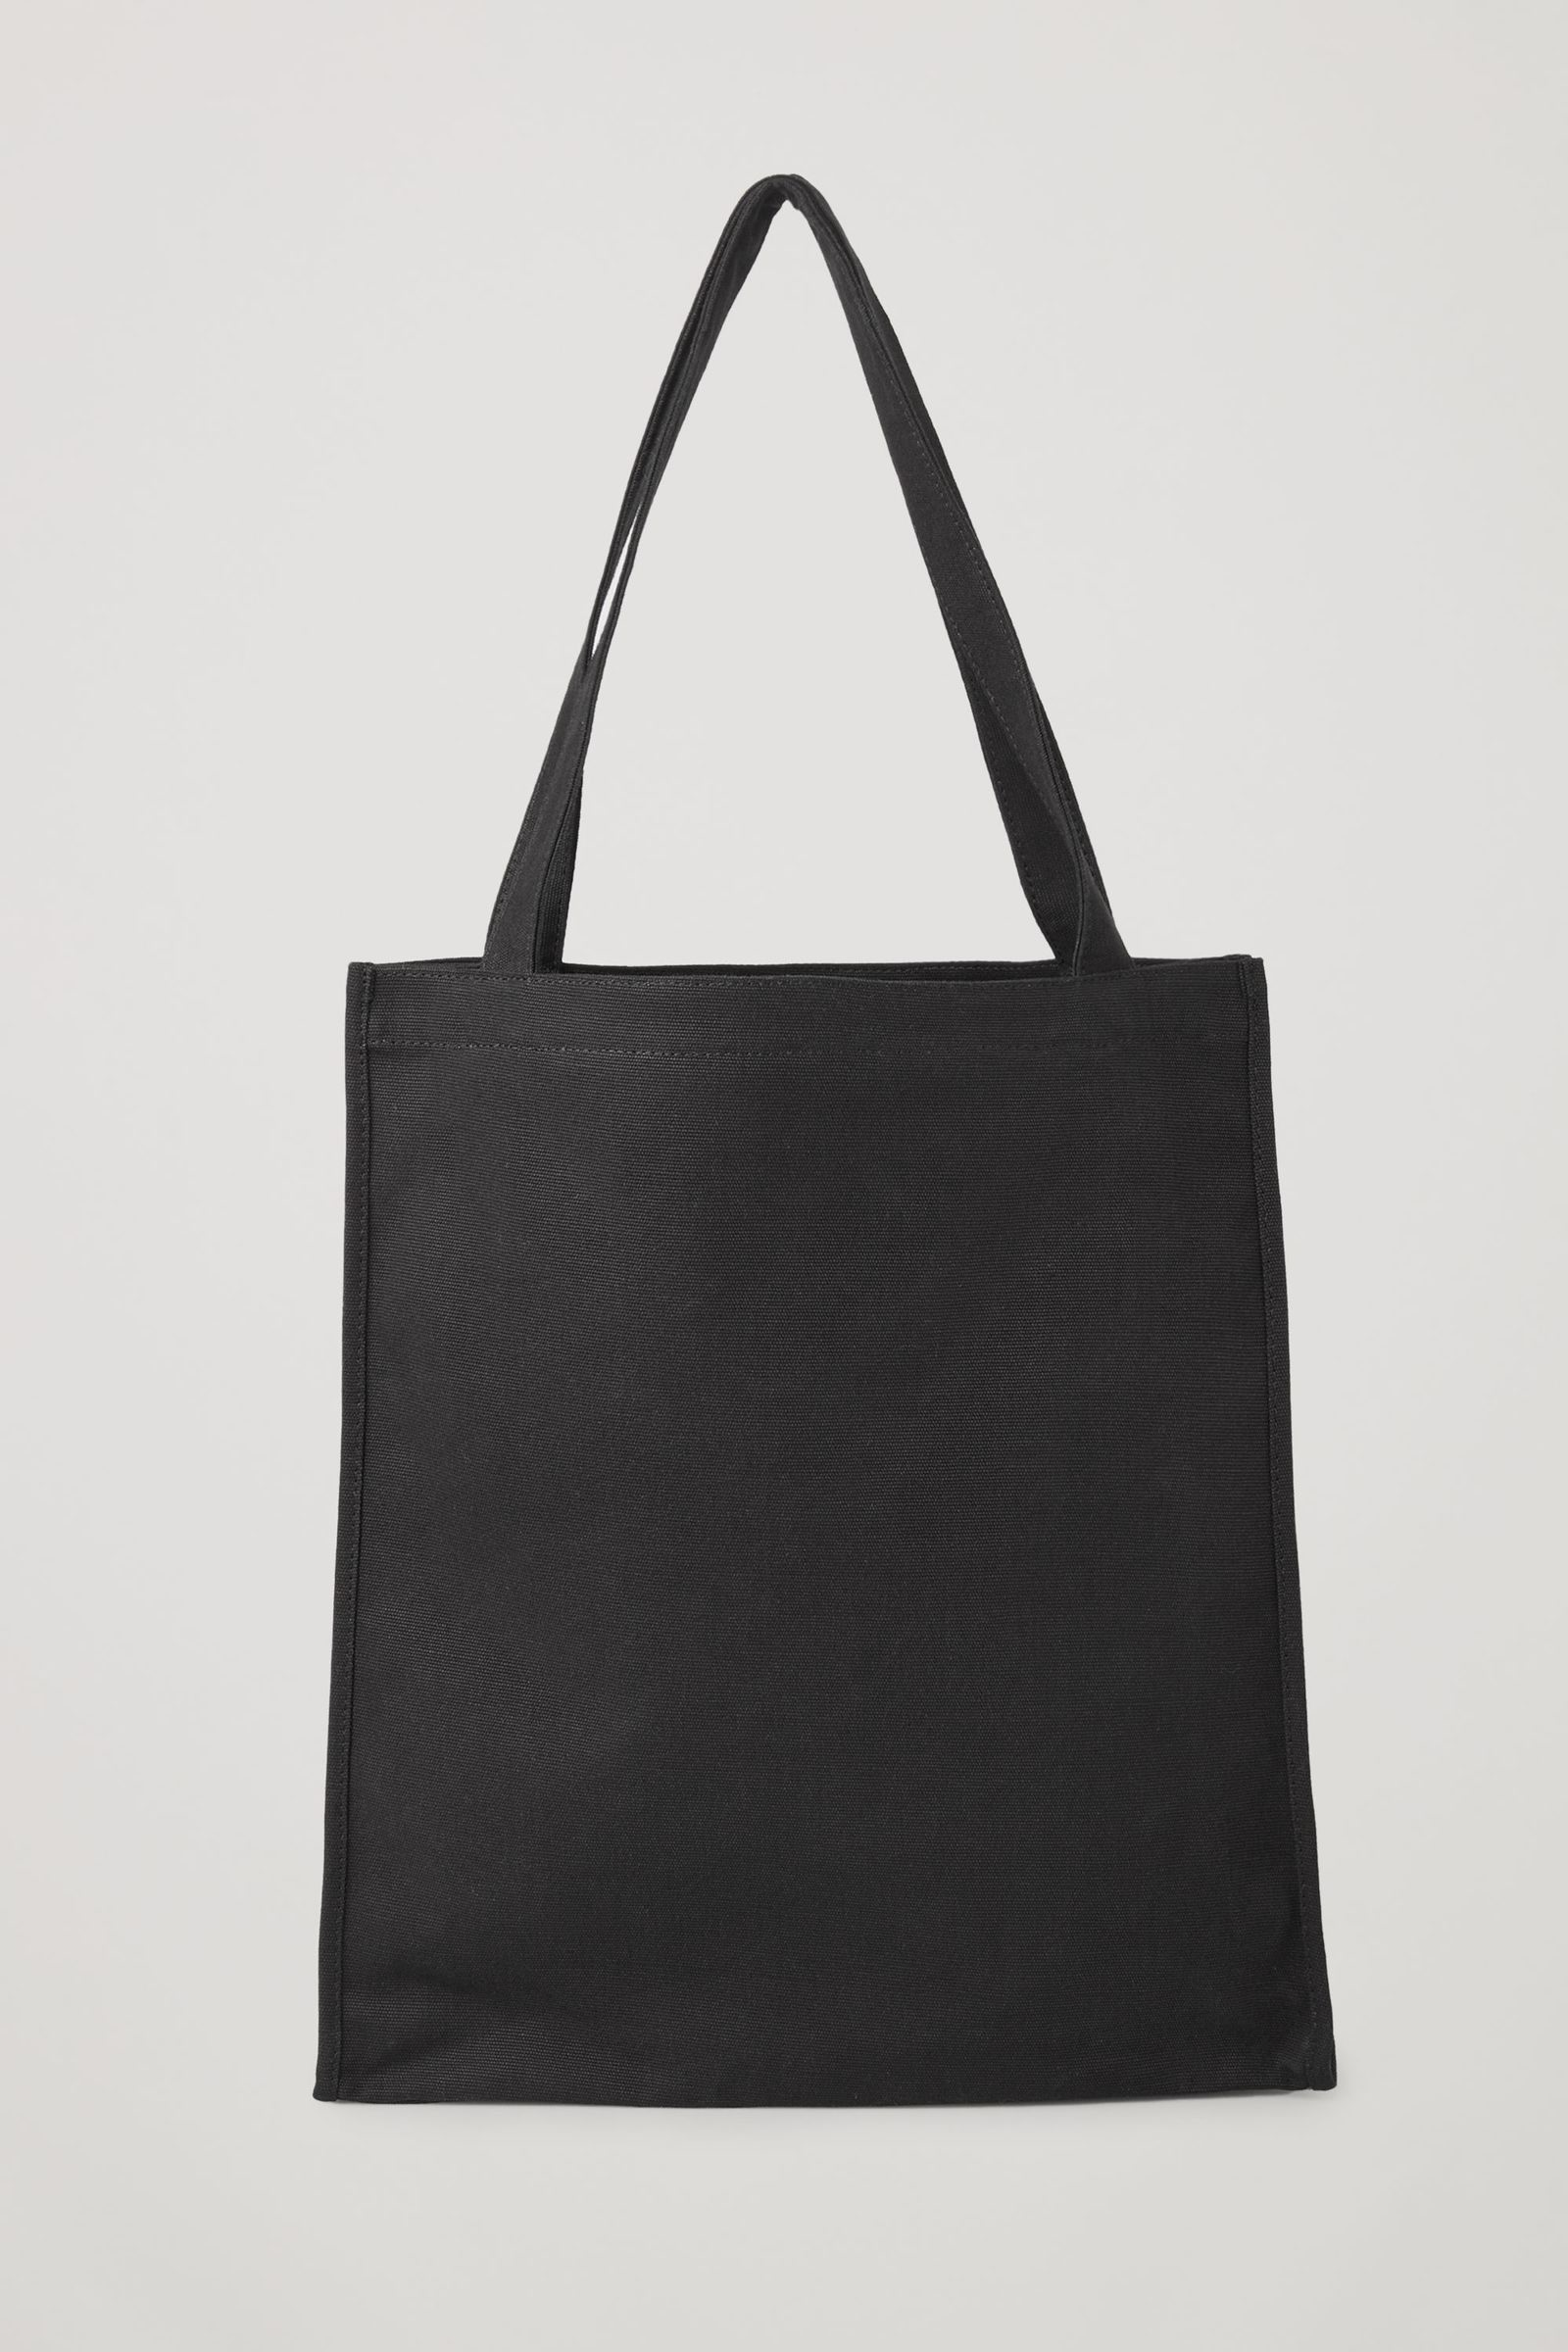 COS 포토 프린트 캔버스 토트백의 블랙 / 베이지컬러 Product입니다.